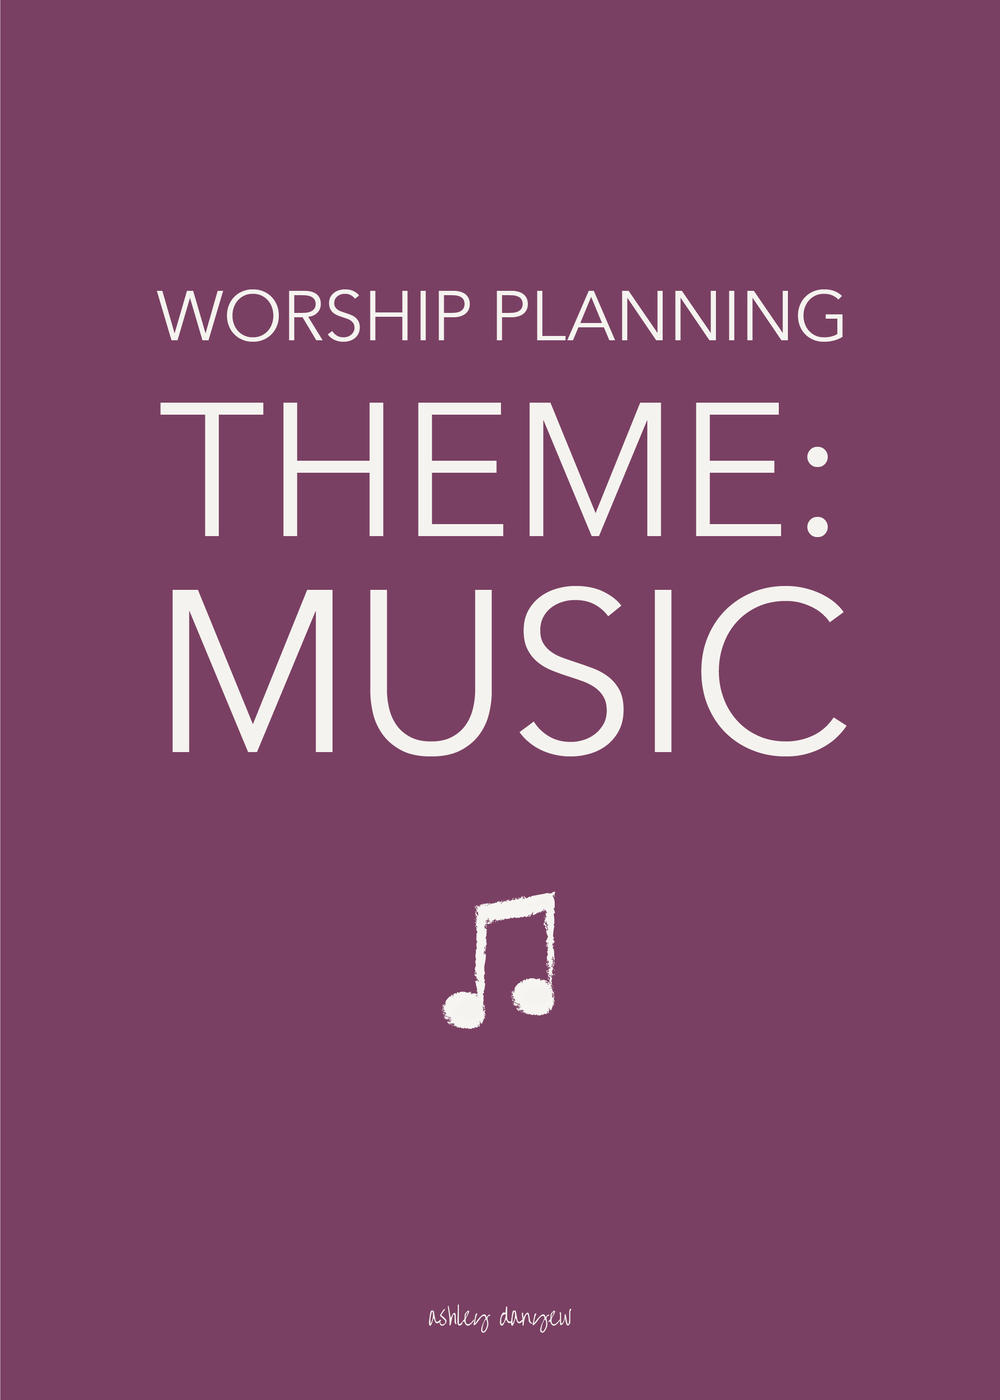 Copy of Worship Planning Theme: Music